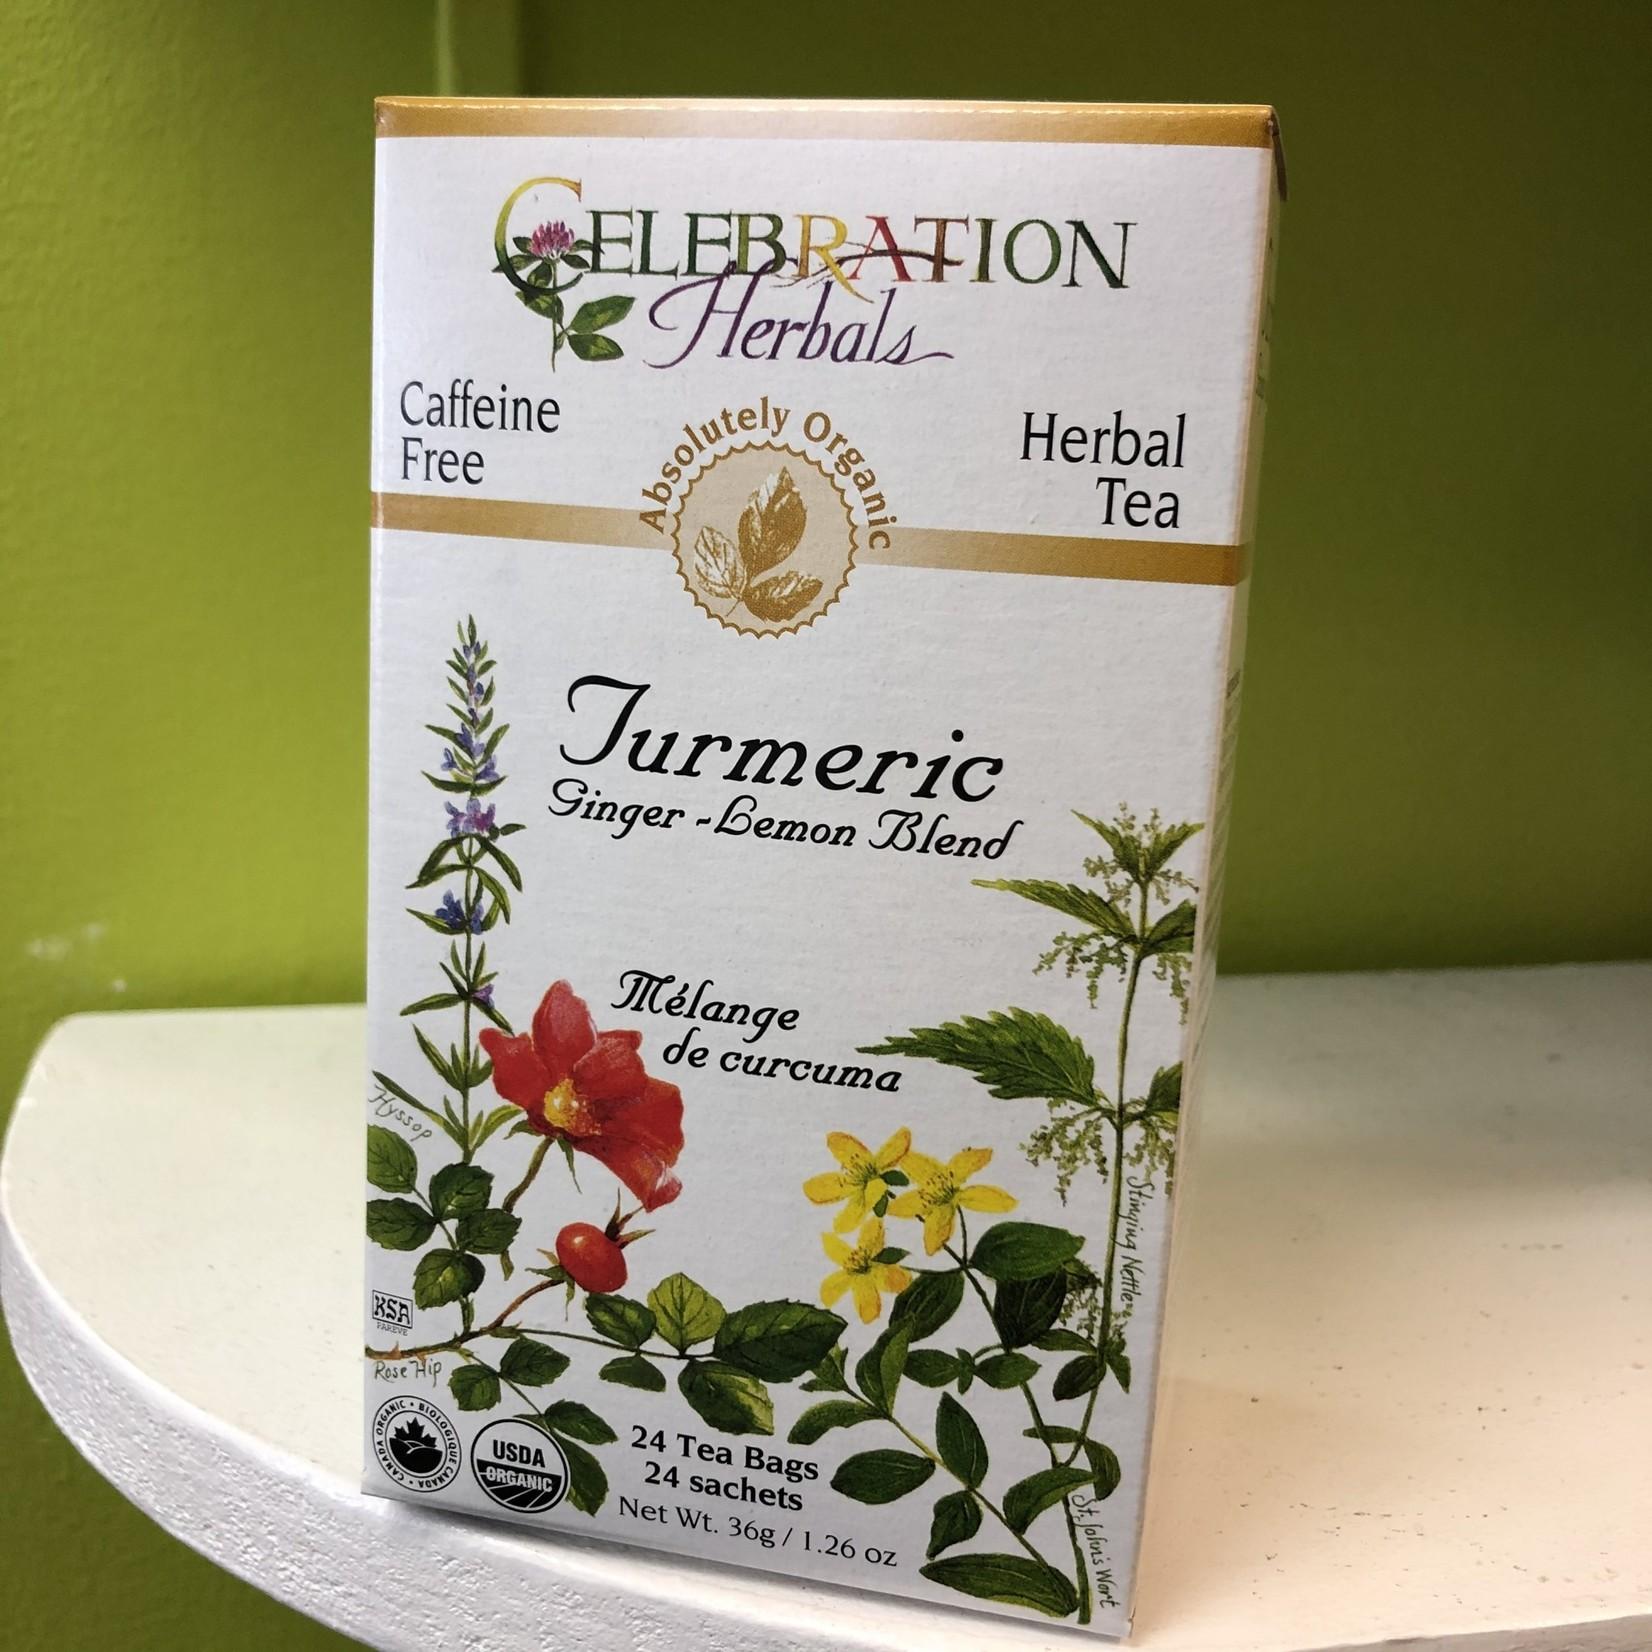 Celebration Herbals Celebration Herbals Turmeric Tea 24 Tea Bags